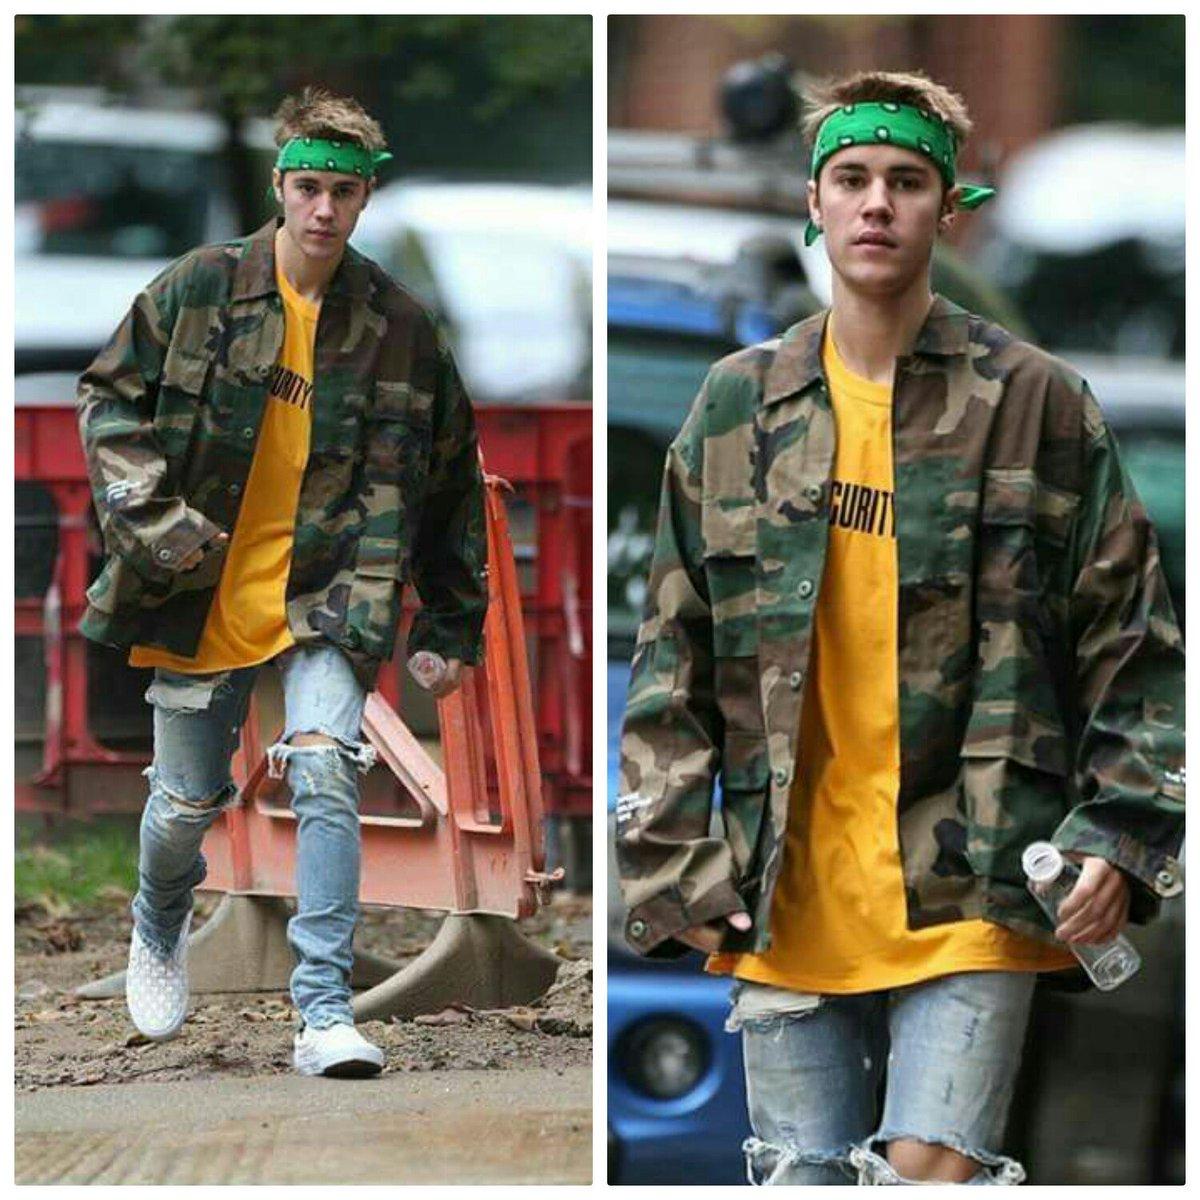 #JustinBieber: Justin Bieber